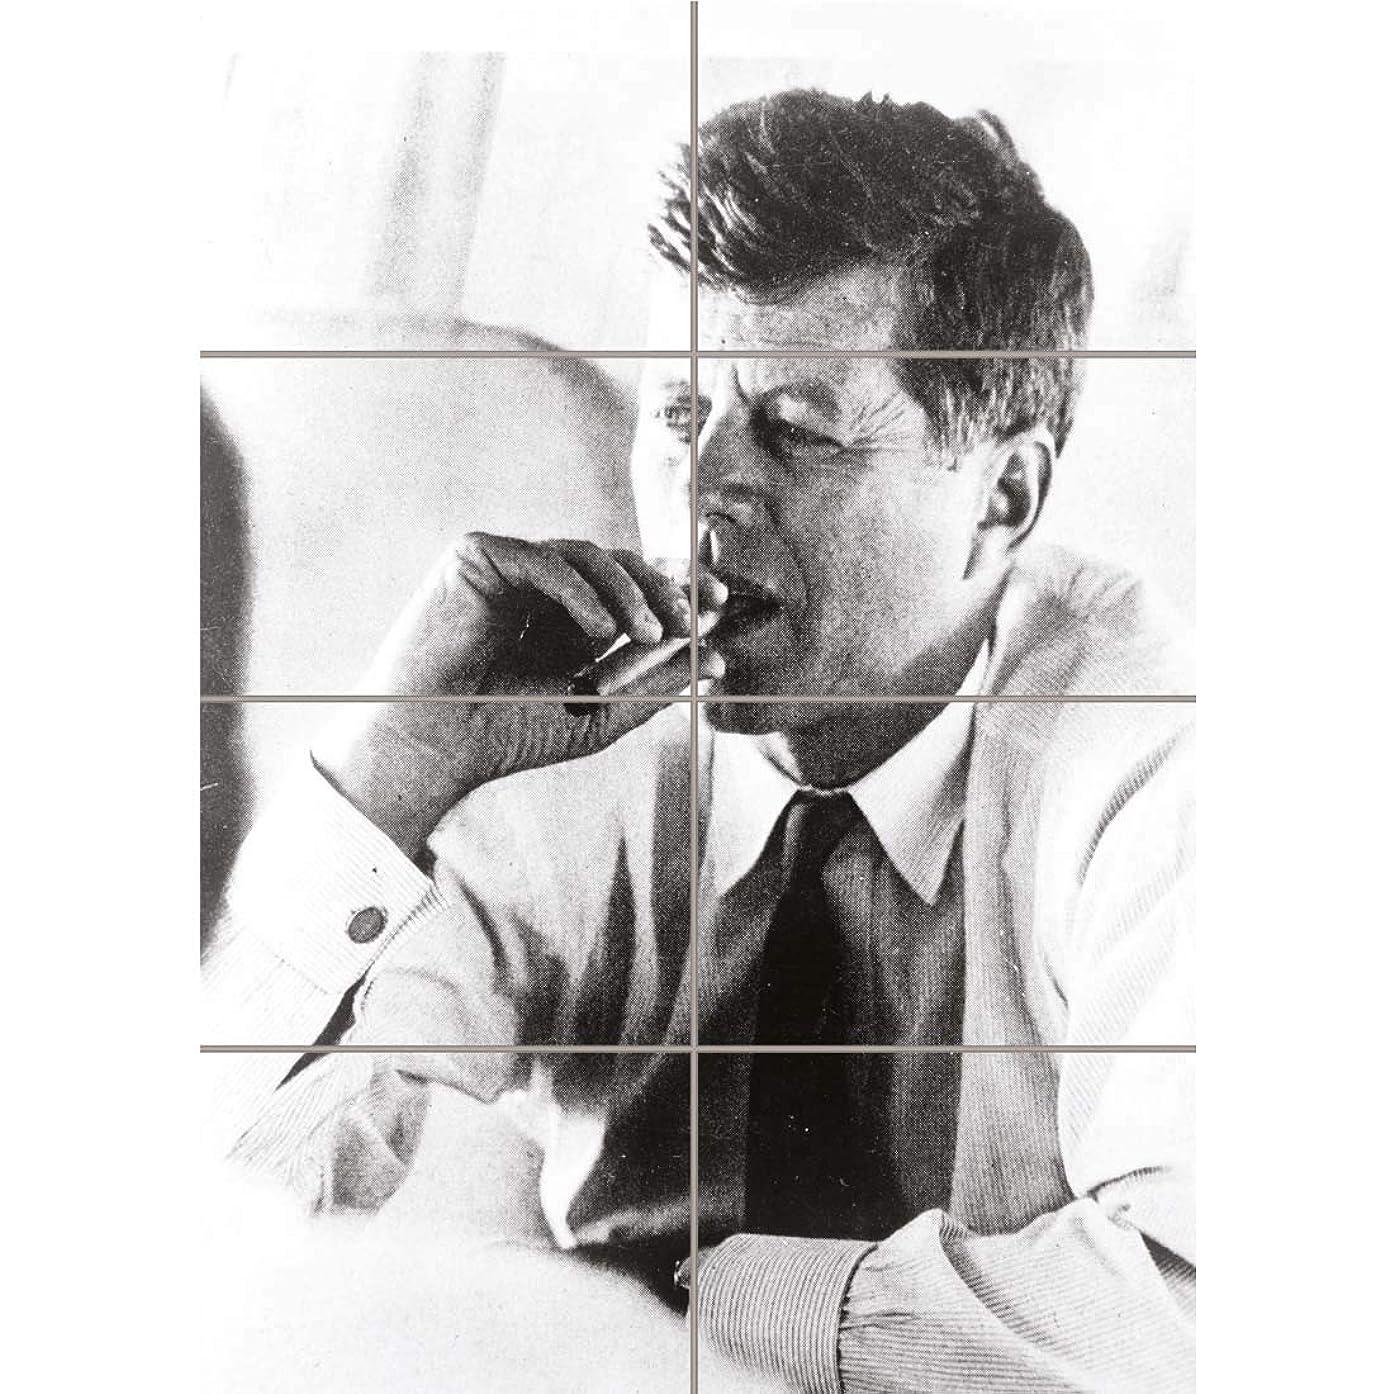 PANEL ART PRINT VINTAGE PHOTOGRAPH PRESIDENT JOHN KENNEDY SMOKE CIGAR JFK USA REPRODUCTION POSTER OZ4758